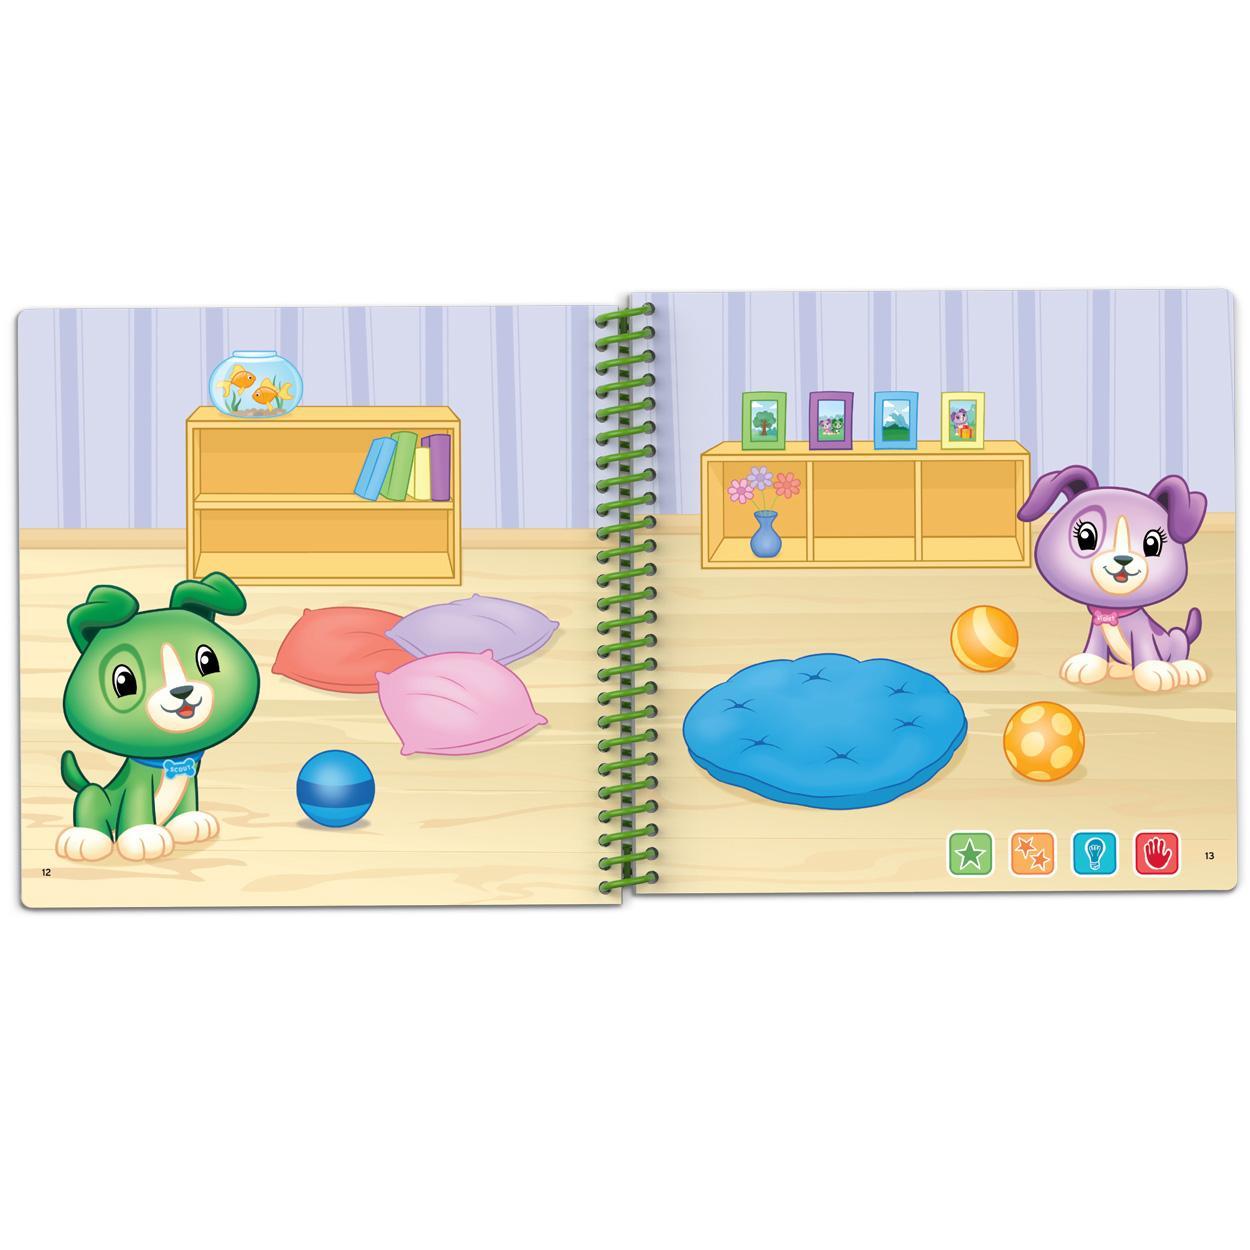 Toys And Games For Preschool : Amazon leapfrog leapstart preschool activity book